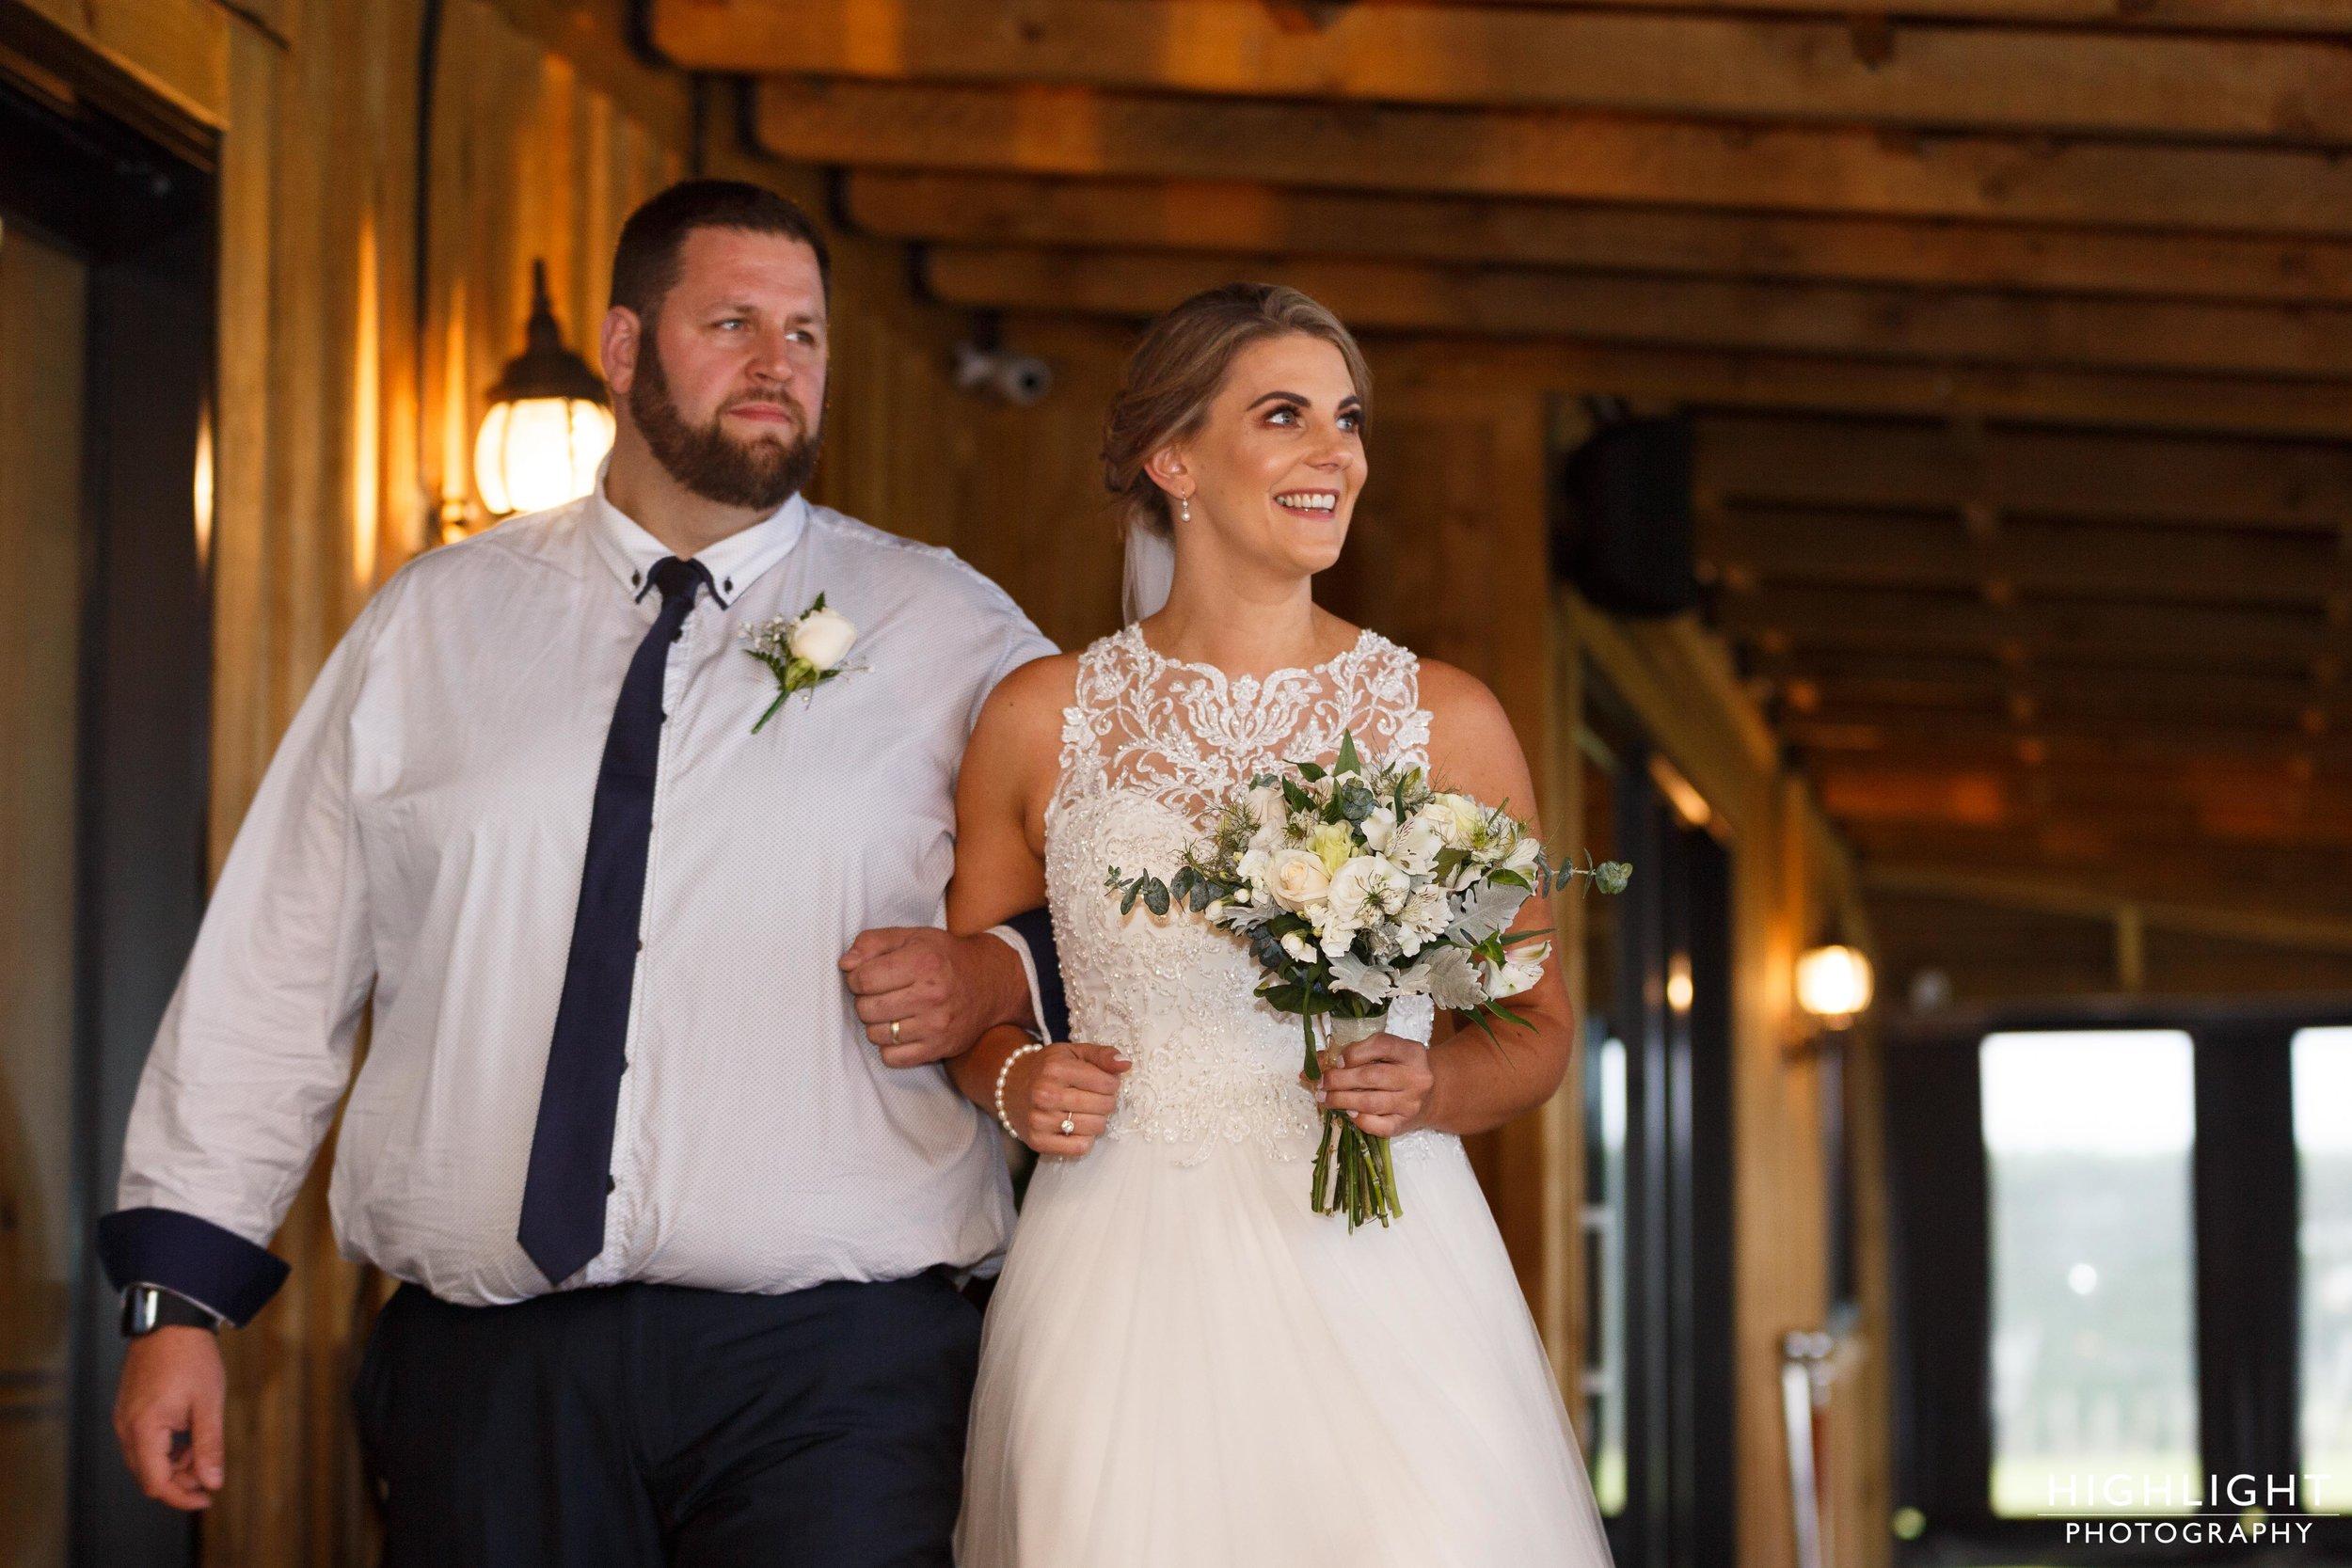 highlight-wedding-photography-palmerston-north-new-zealand-orlando-country-club-wedding-82.jpg